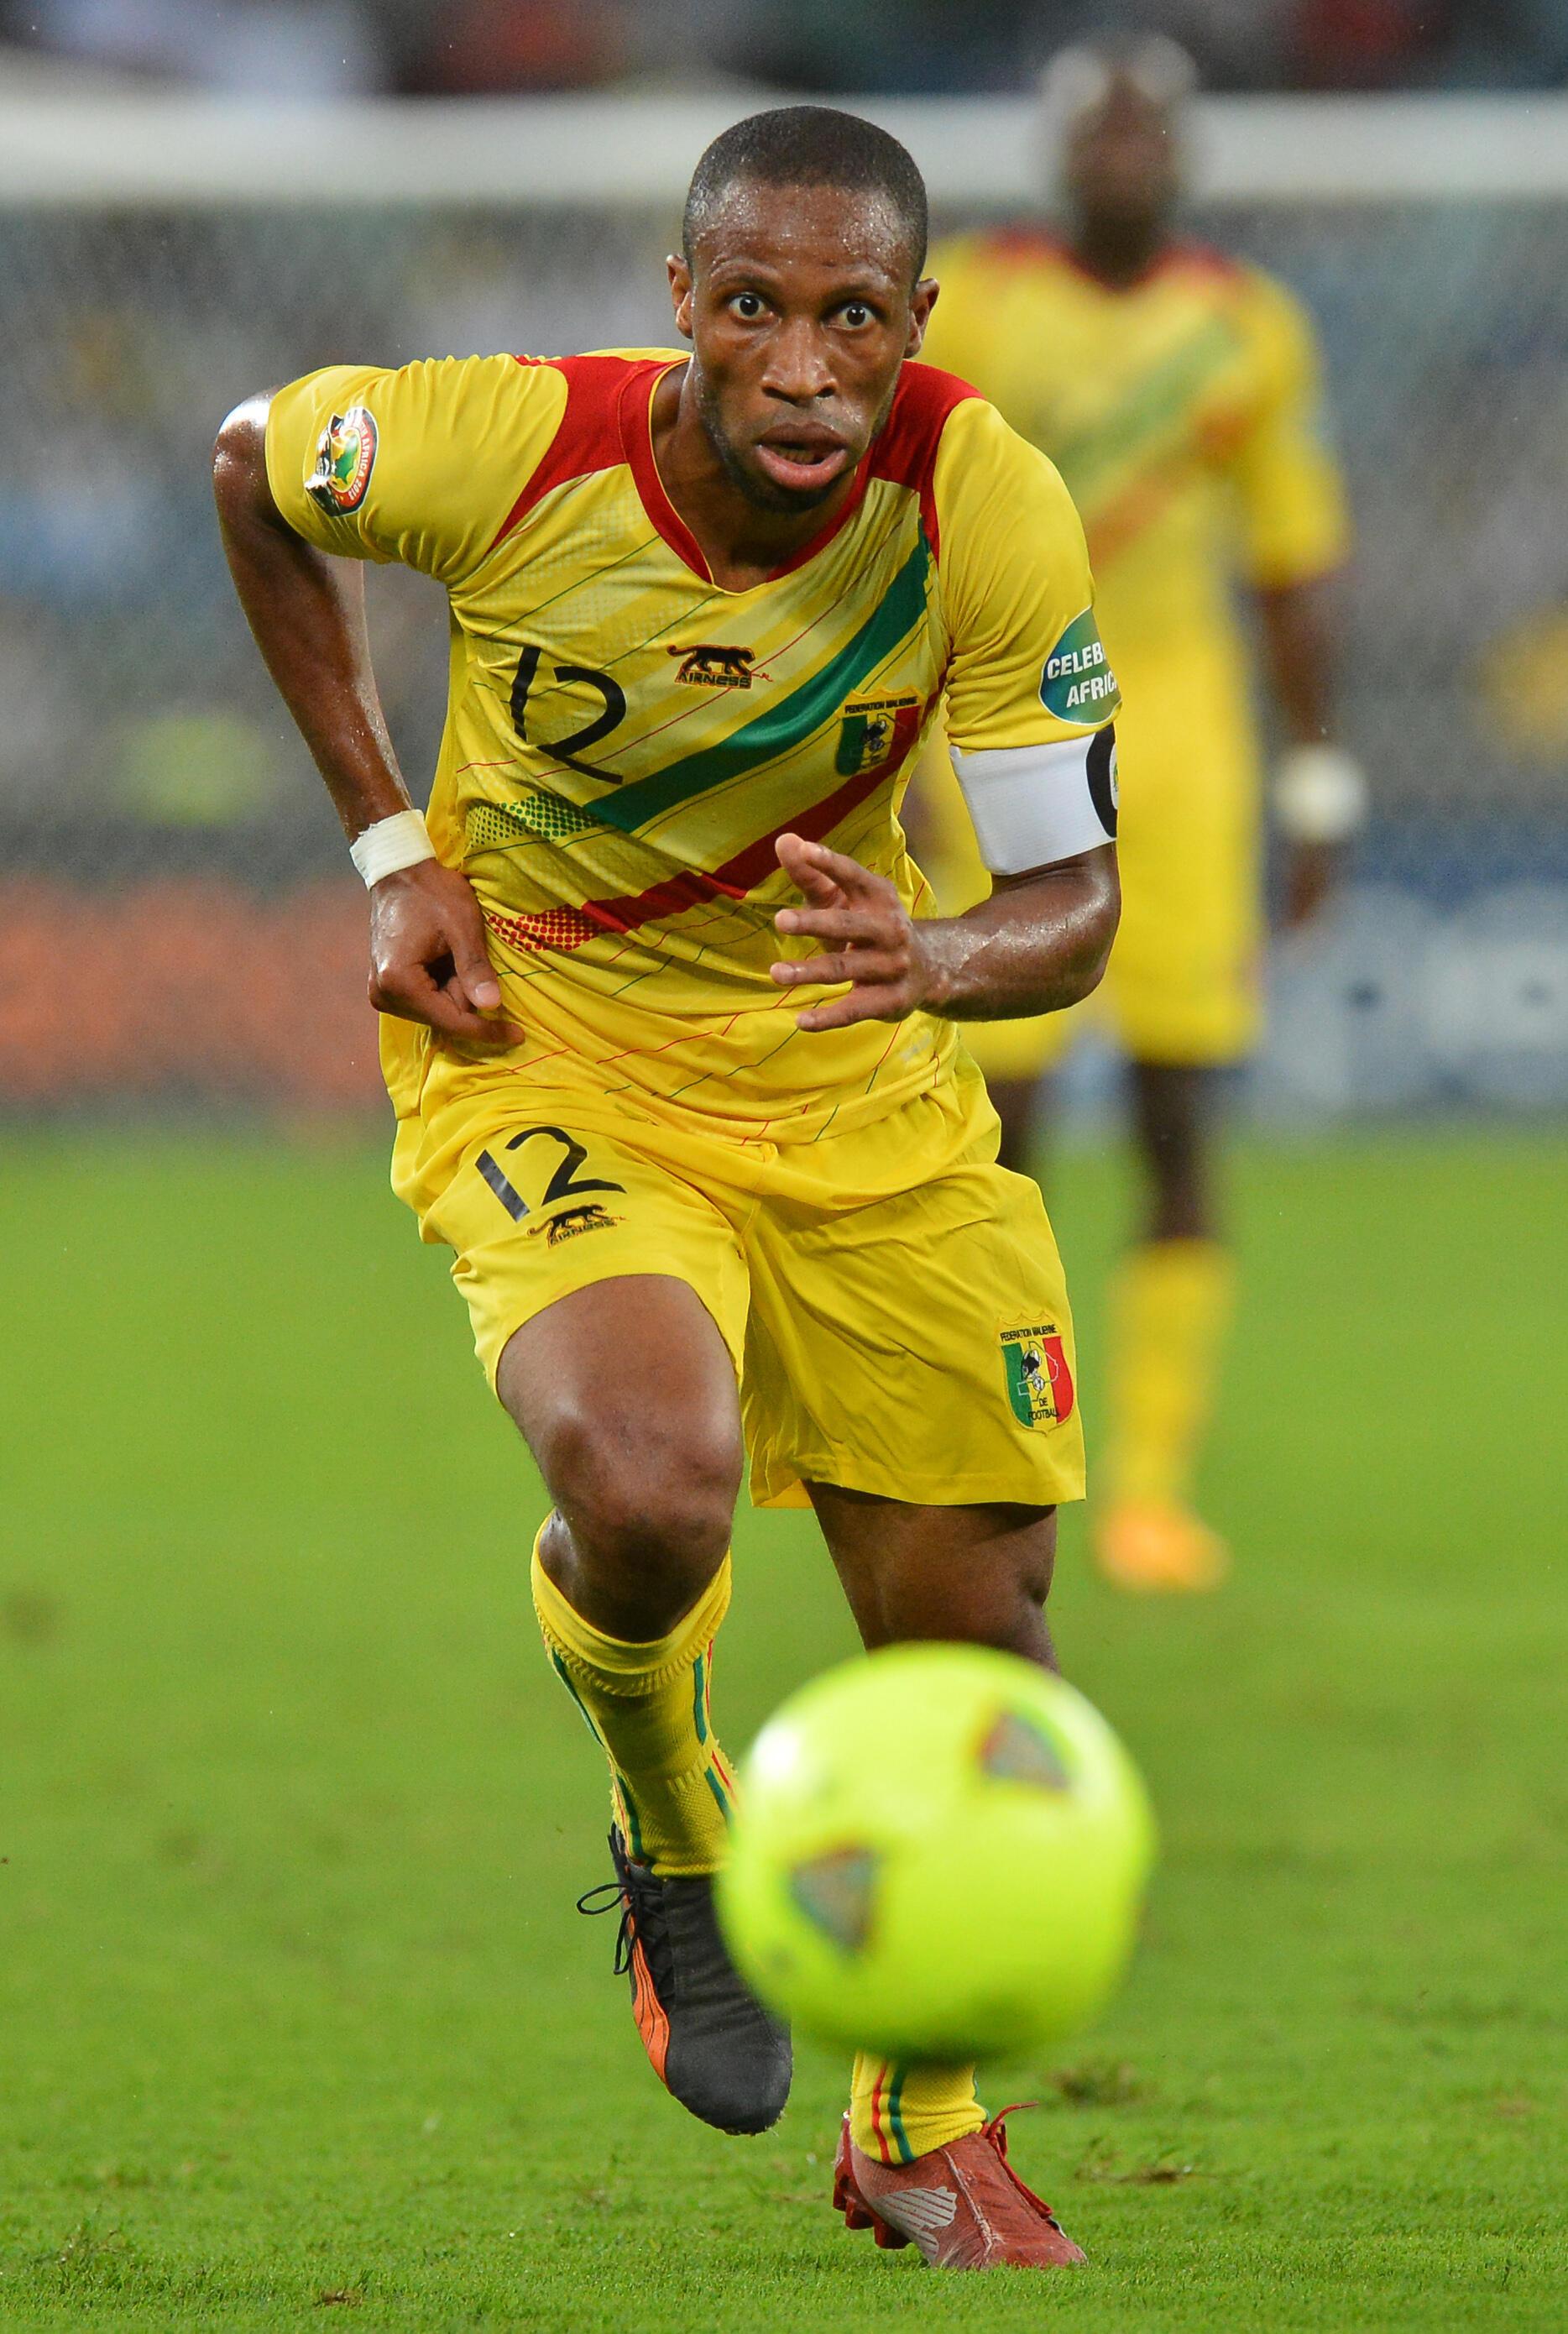 Goodbye to him? Mali's Seydou Keita